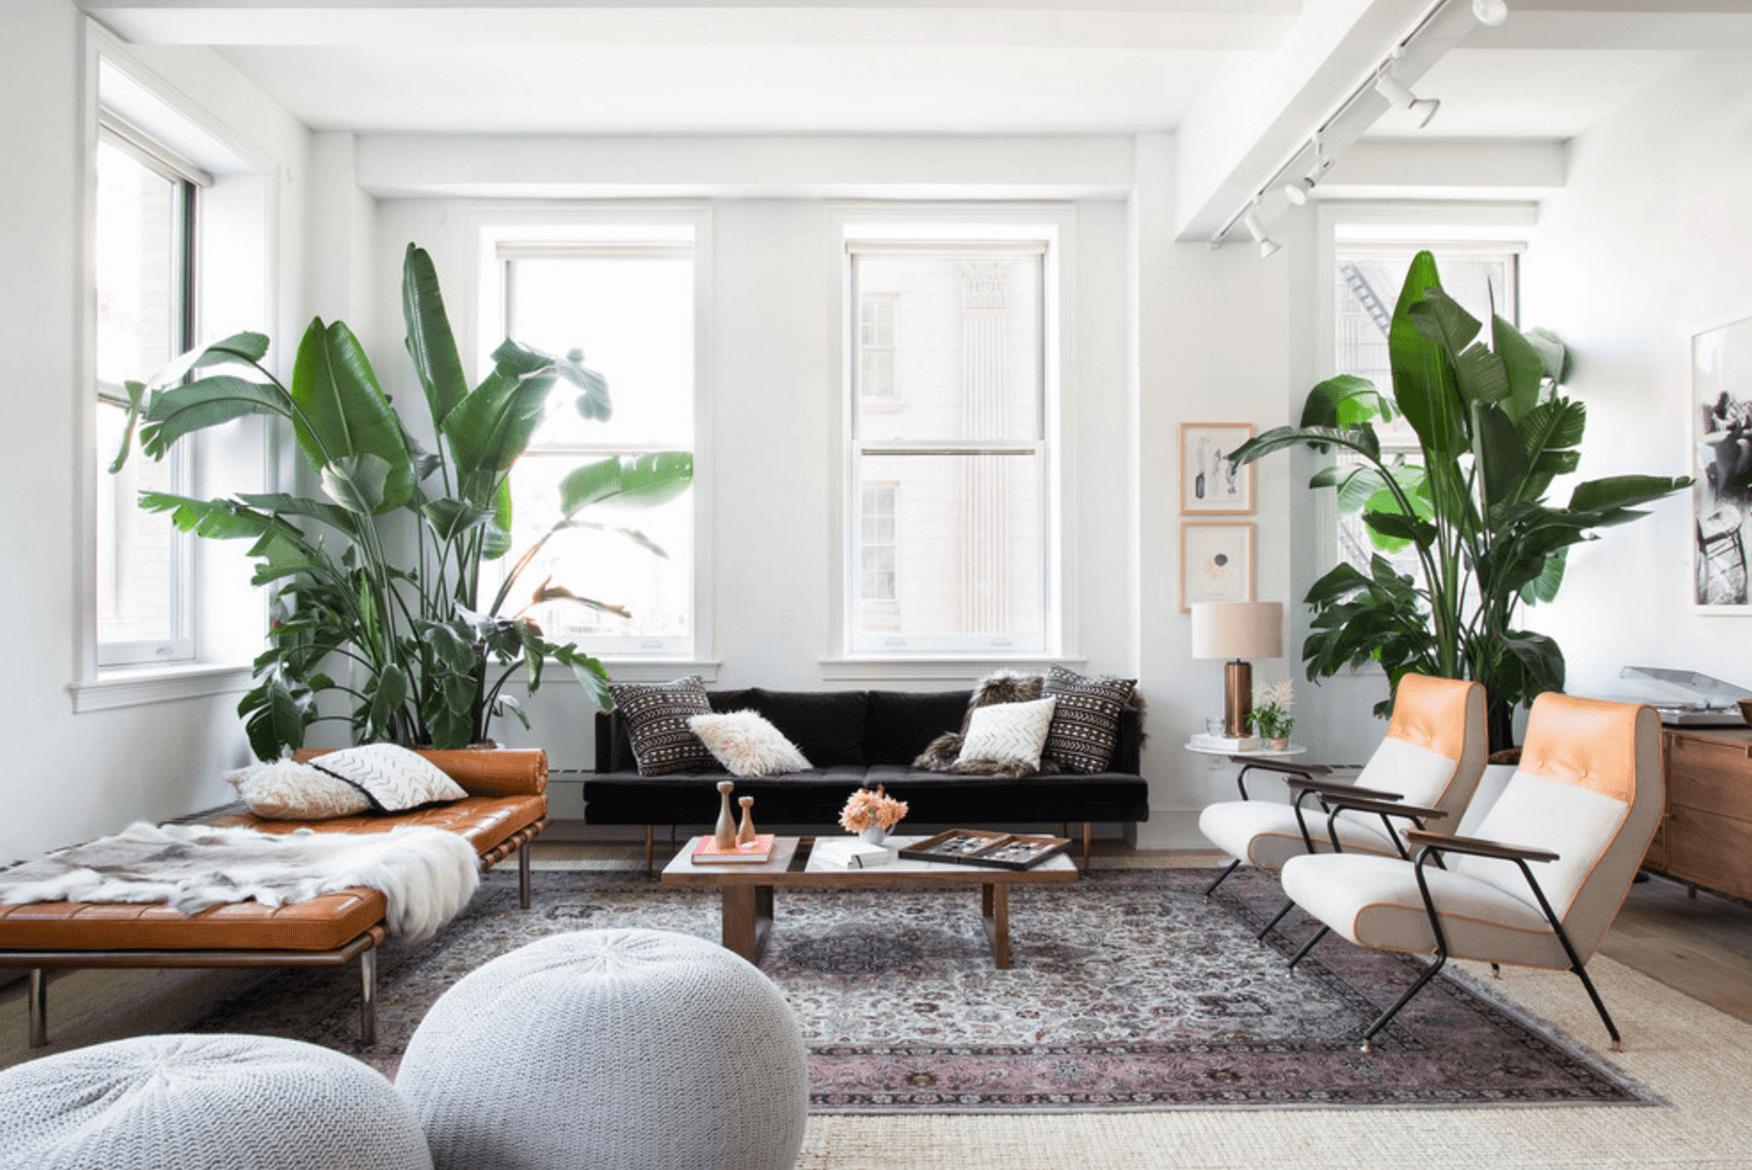 Stunningly Scandinavian Interior Designs Living Room Scandinavian Living Room Decor White Rooms #scandinavian #living #room #style